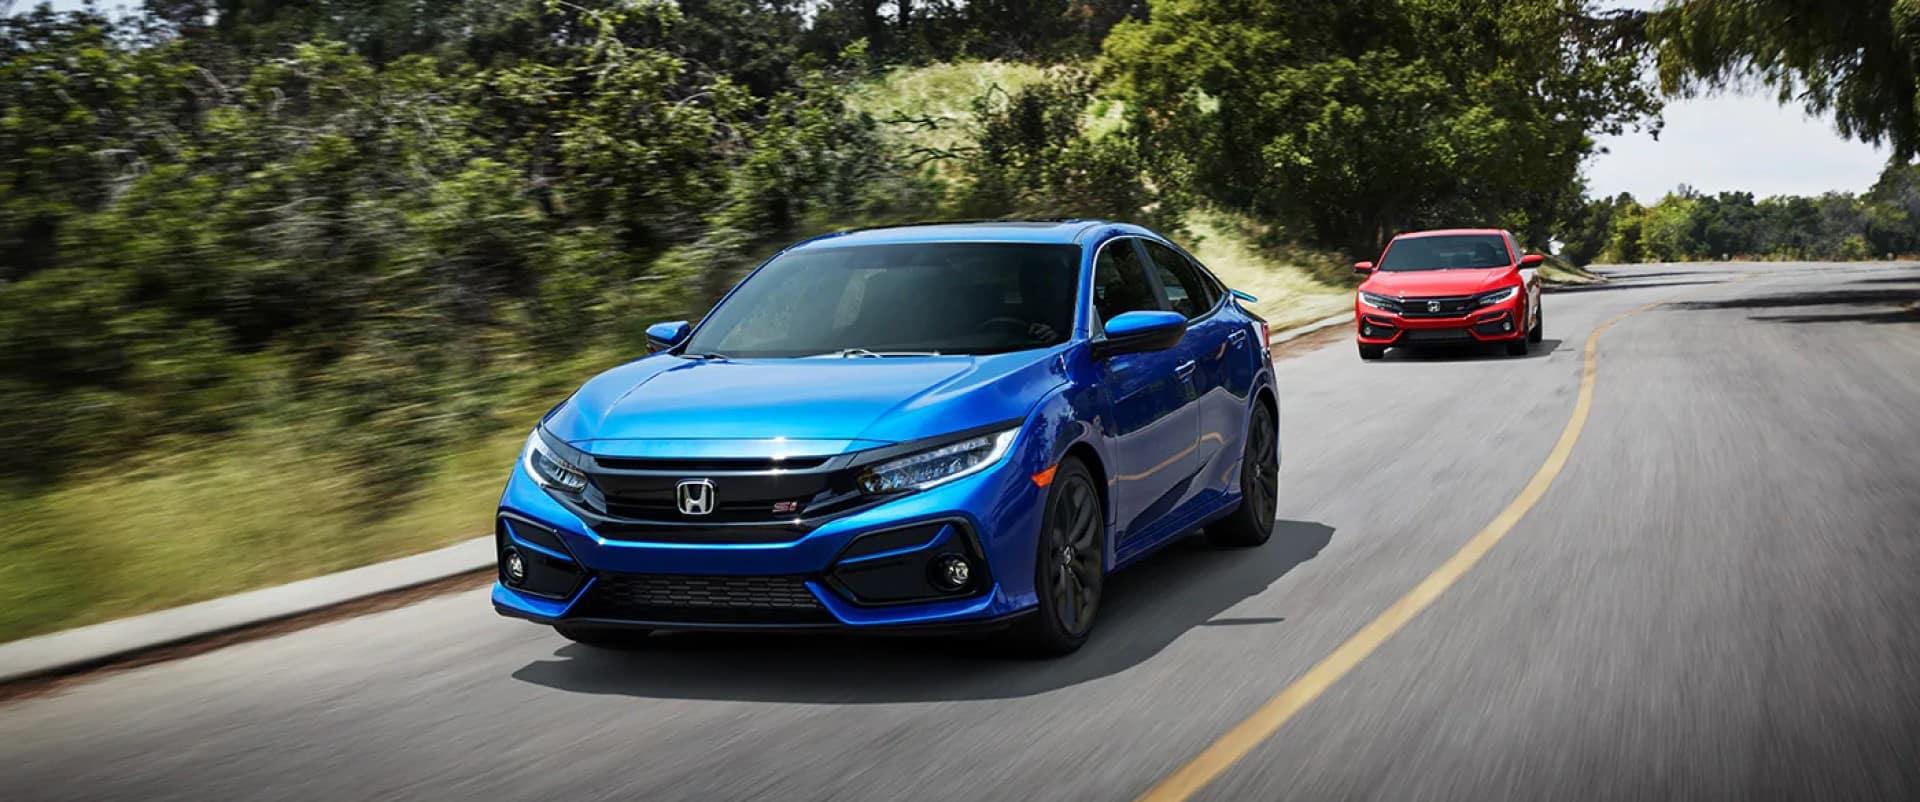 Honda_Civic_Si_Sedan_Driving_Back_Road